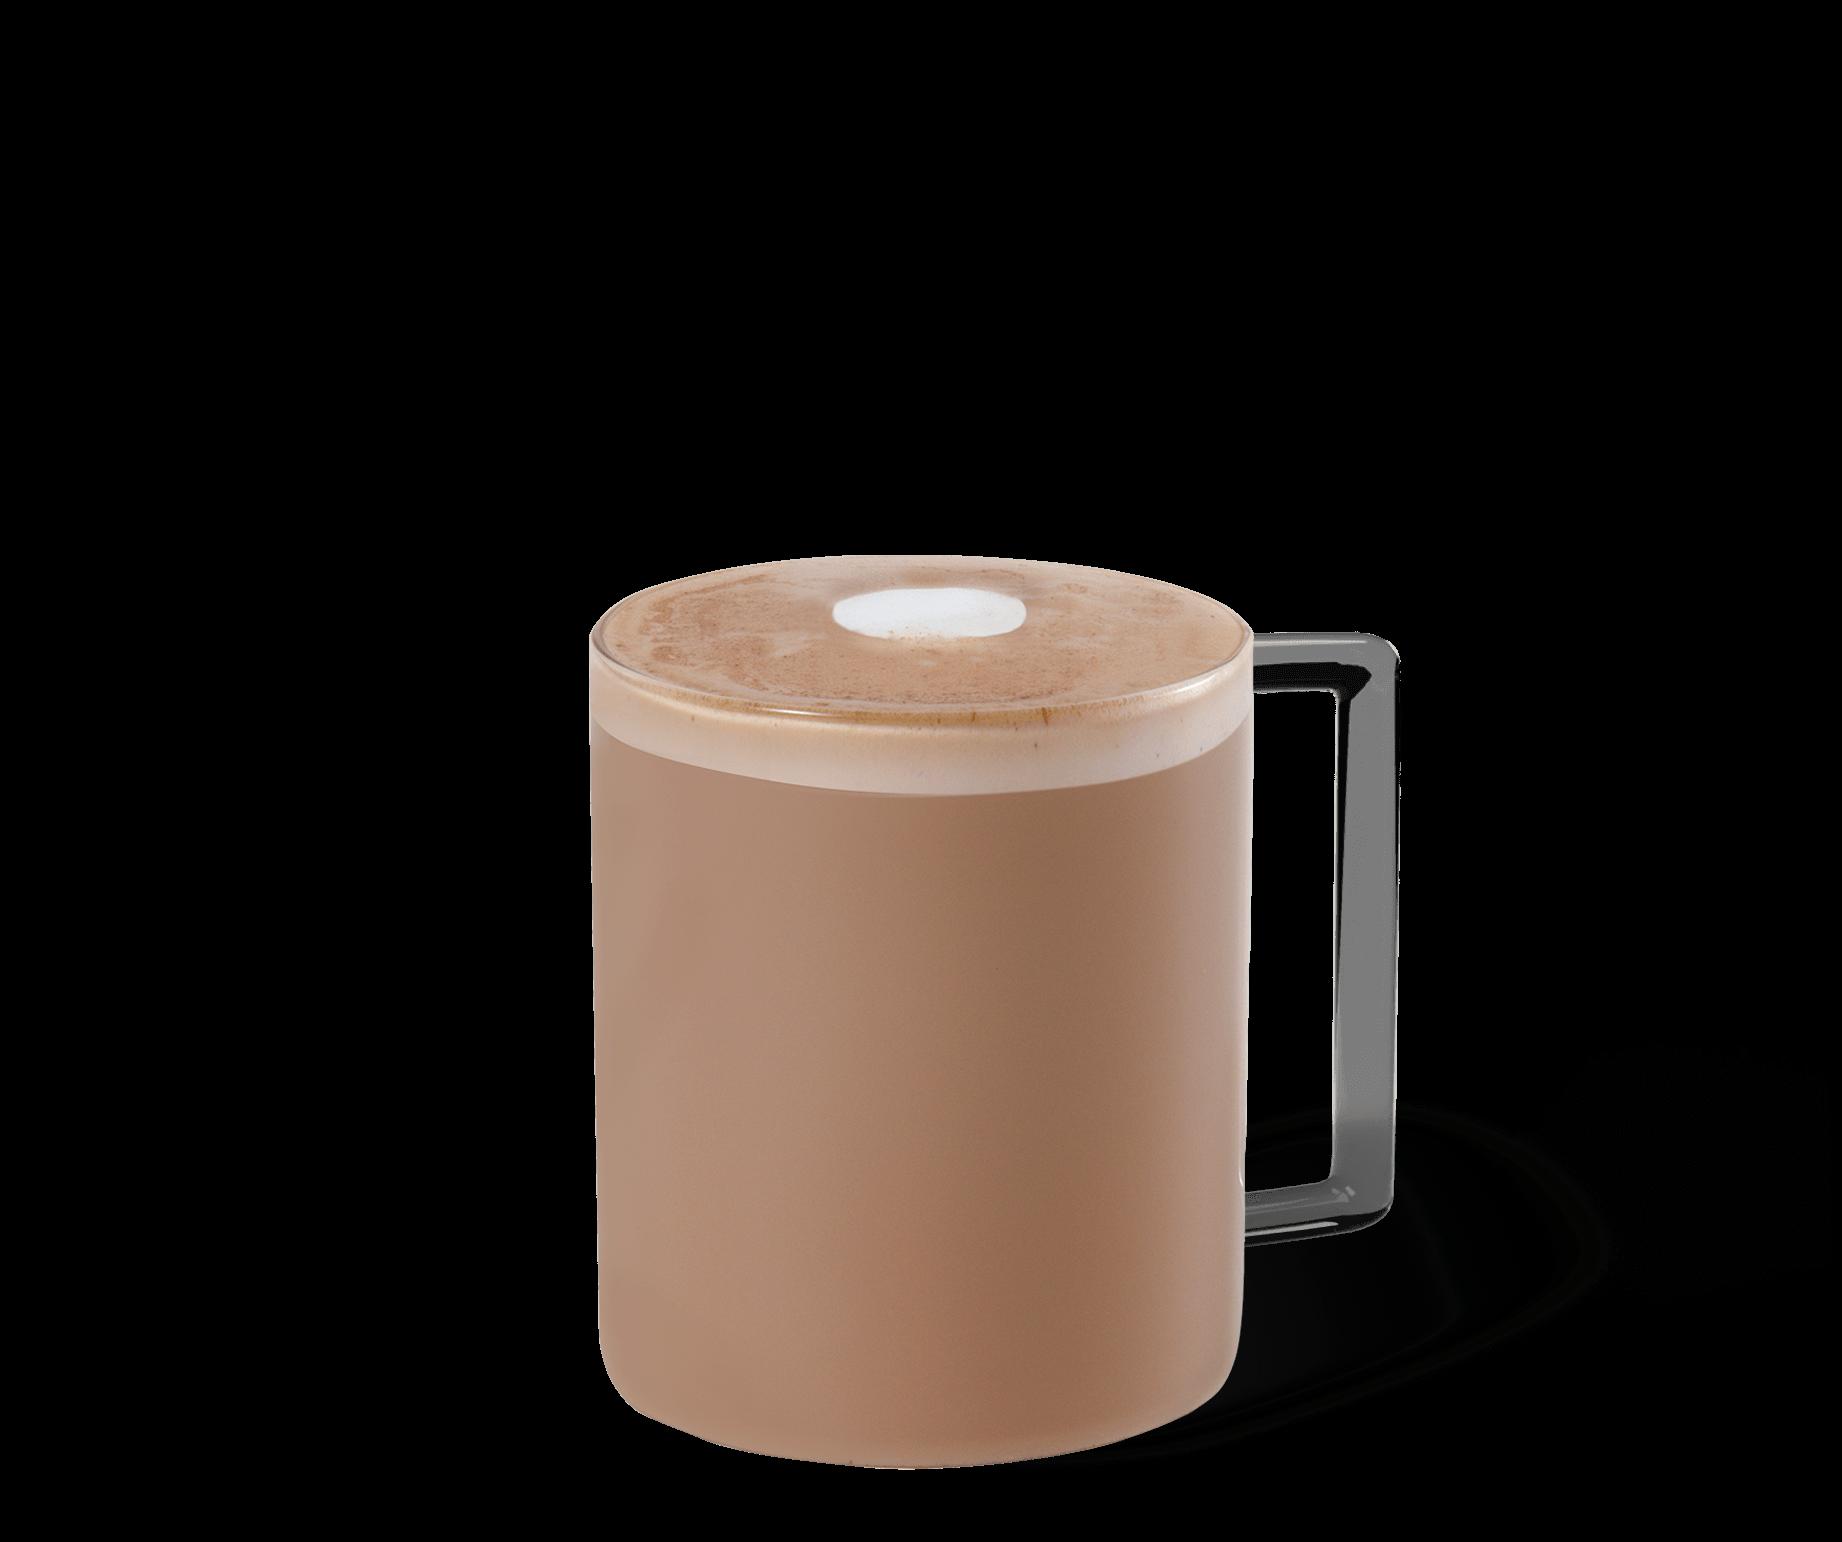 Spiced Espresso im Kaffeebecher